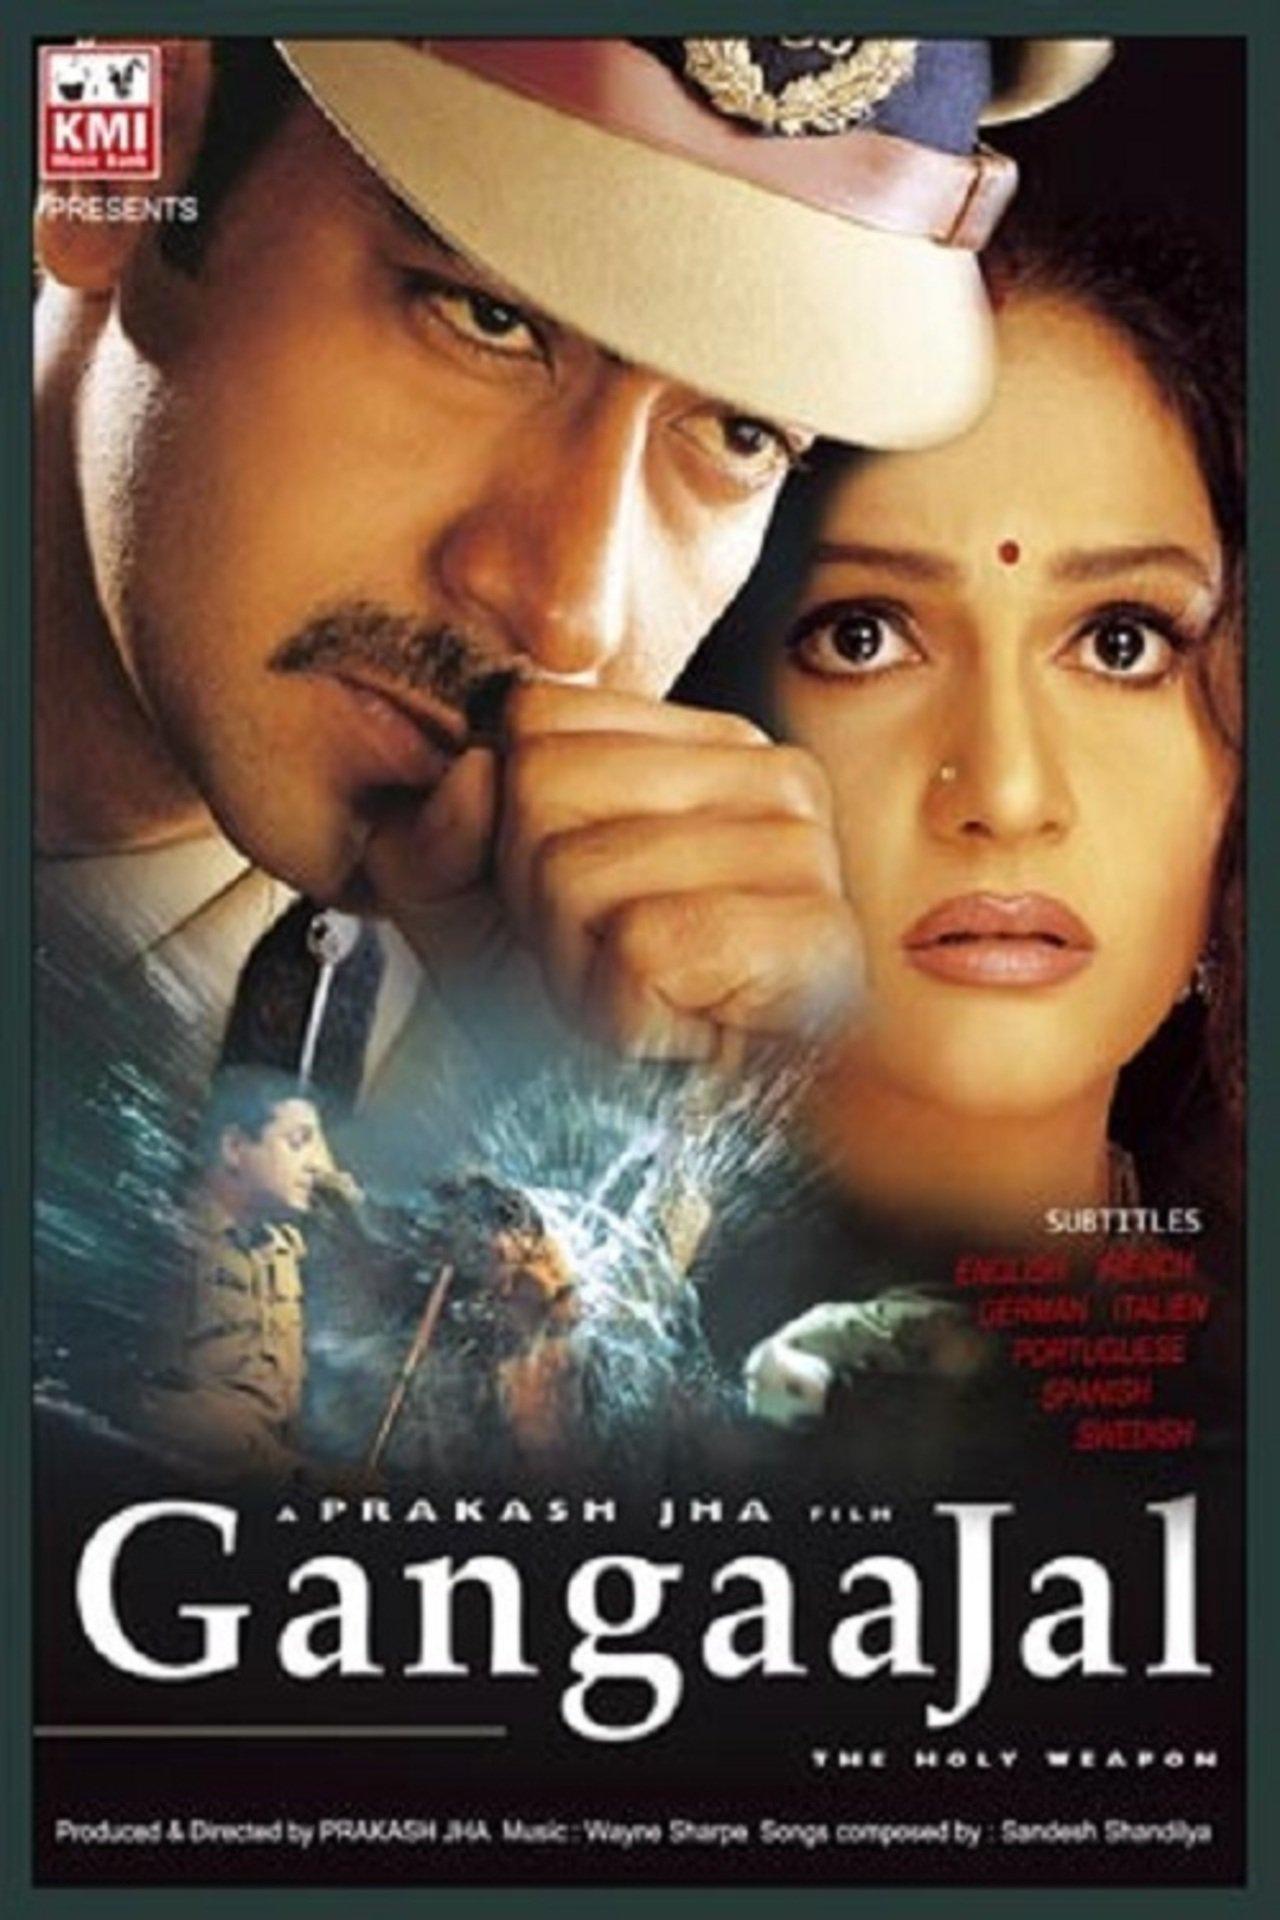 Gangaajal Movie Poster Ajay Devgan And Gracy Singh